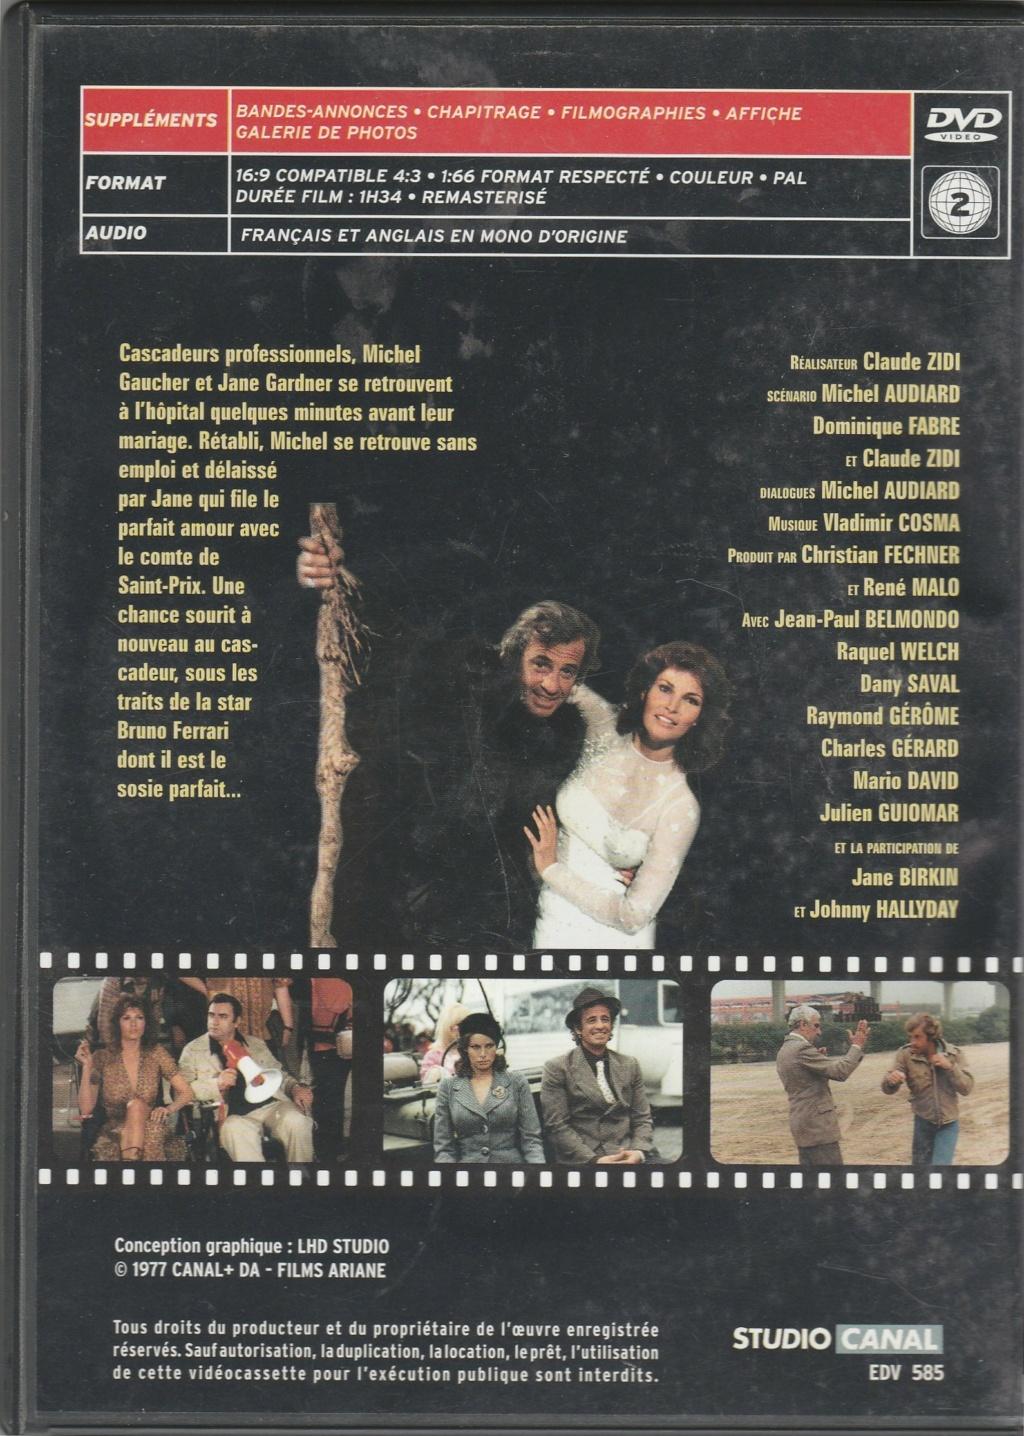 JAQUETTE DVD FILMS ( Jaquette + Sticker ) - Page 2 Img_2732